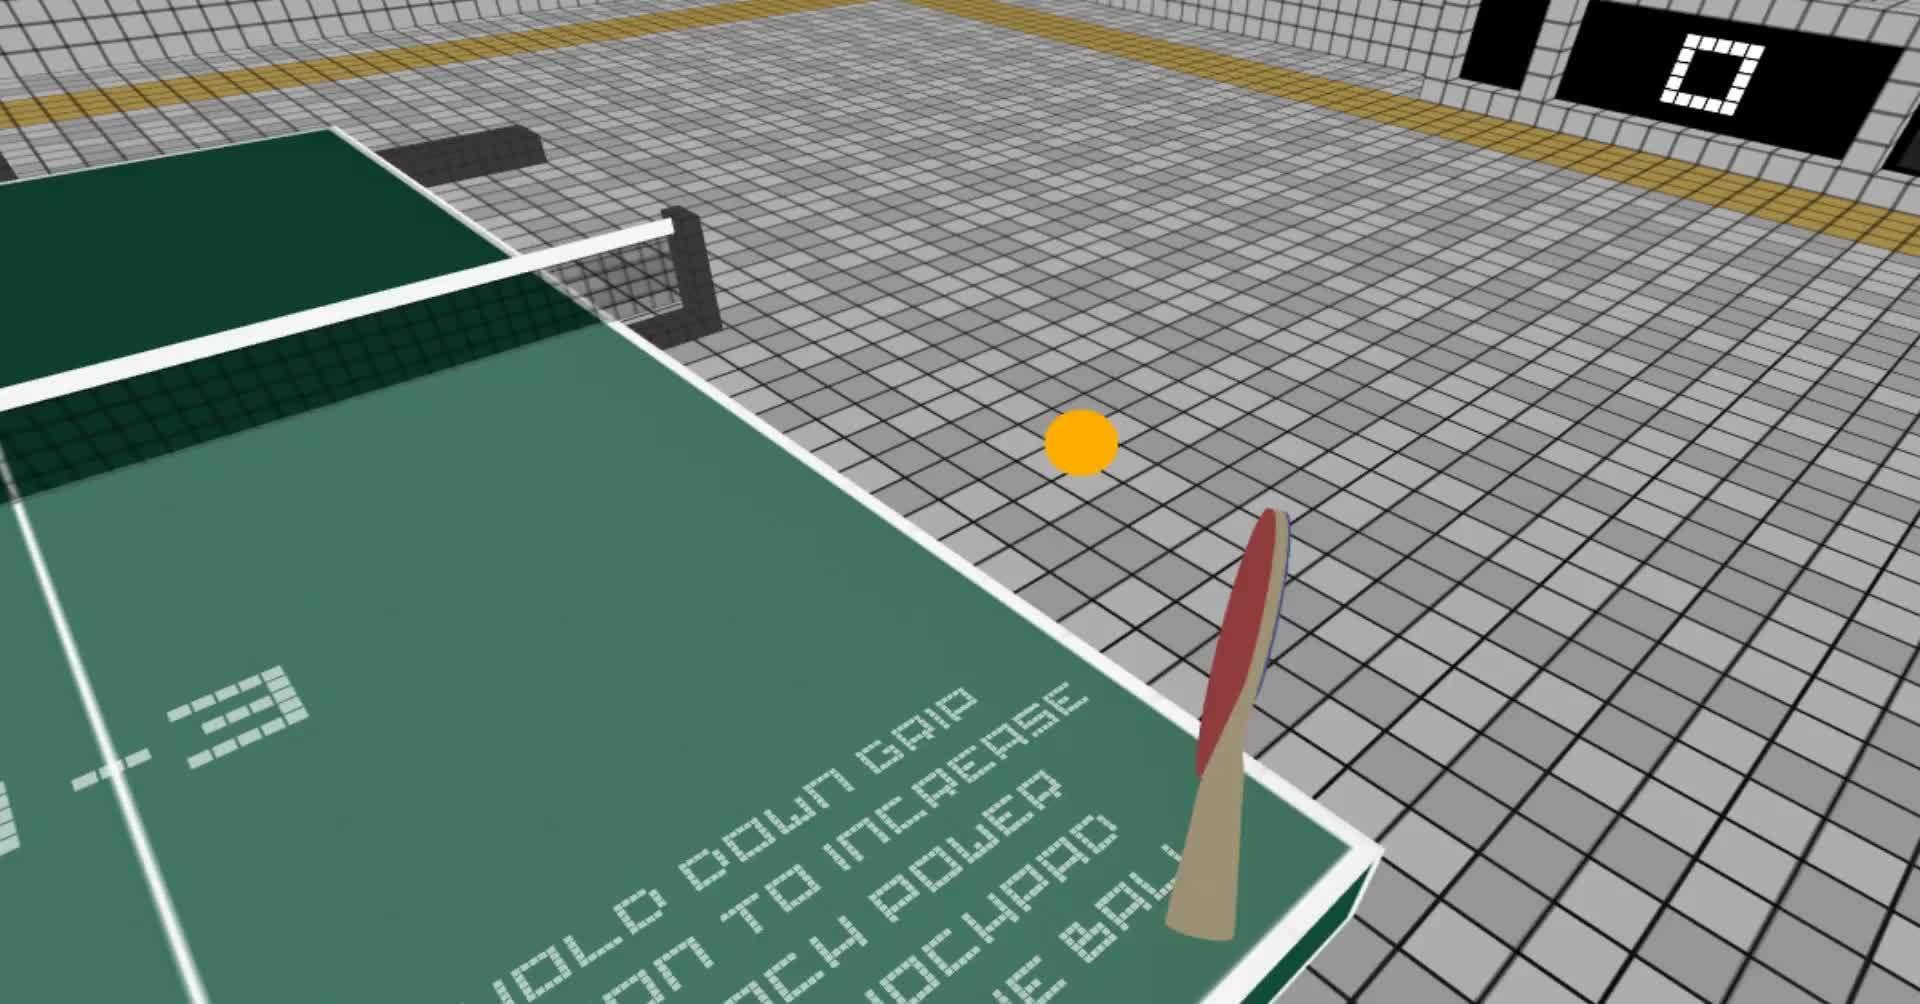 60fpsgaminggifs, virtualreality, vive, [VR Ping Pong] HTC Vive GIFs